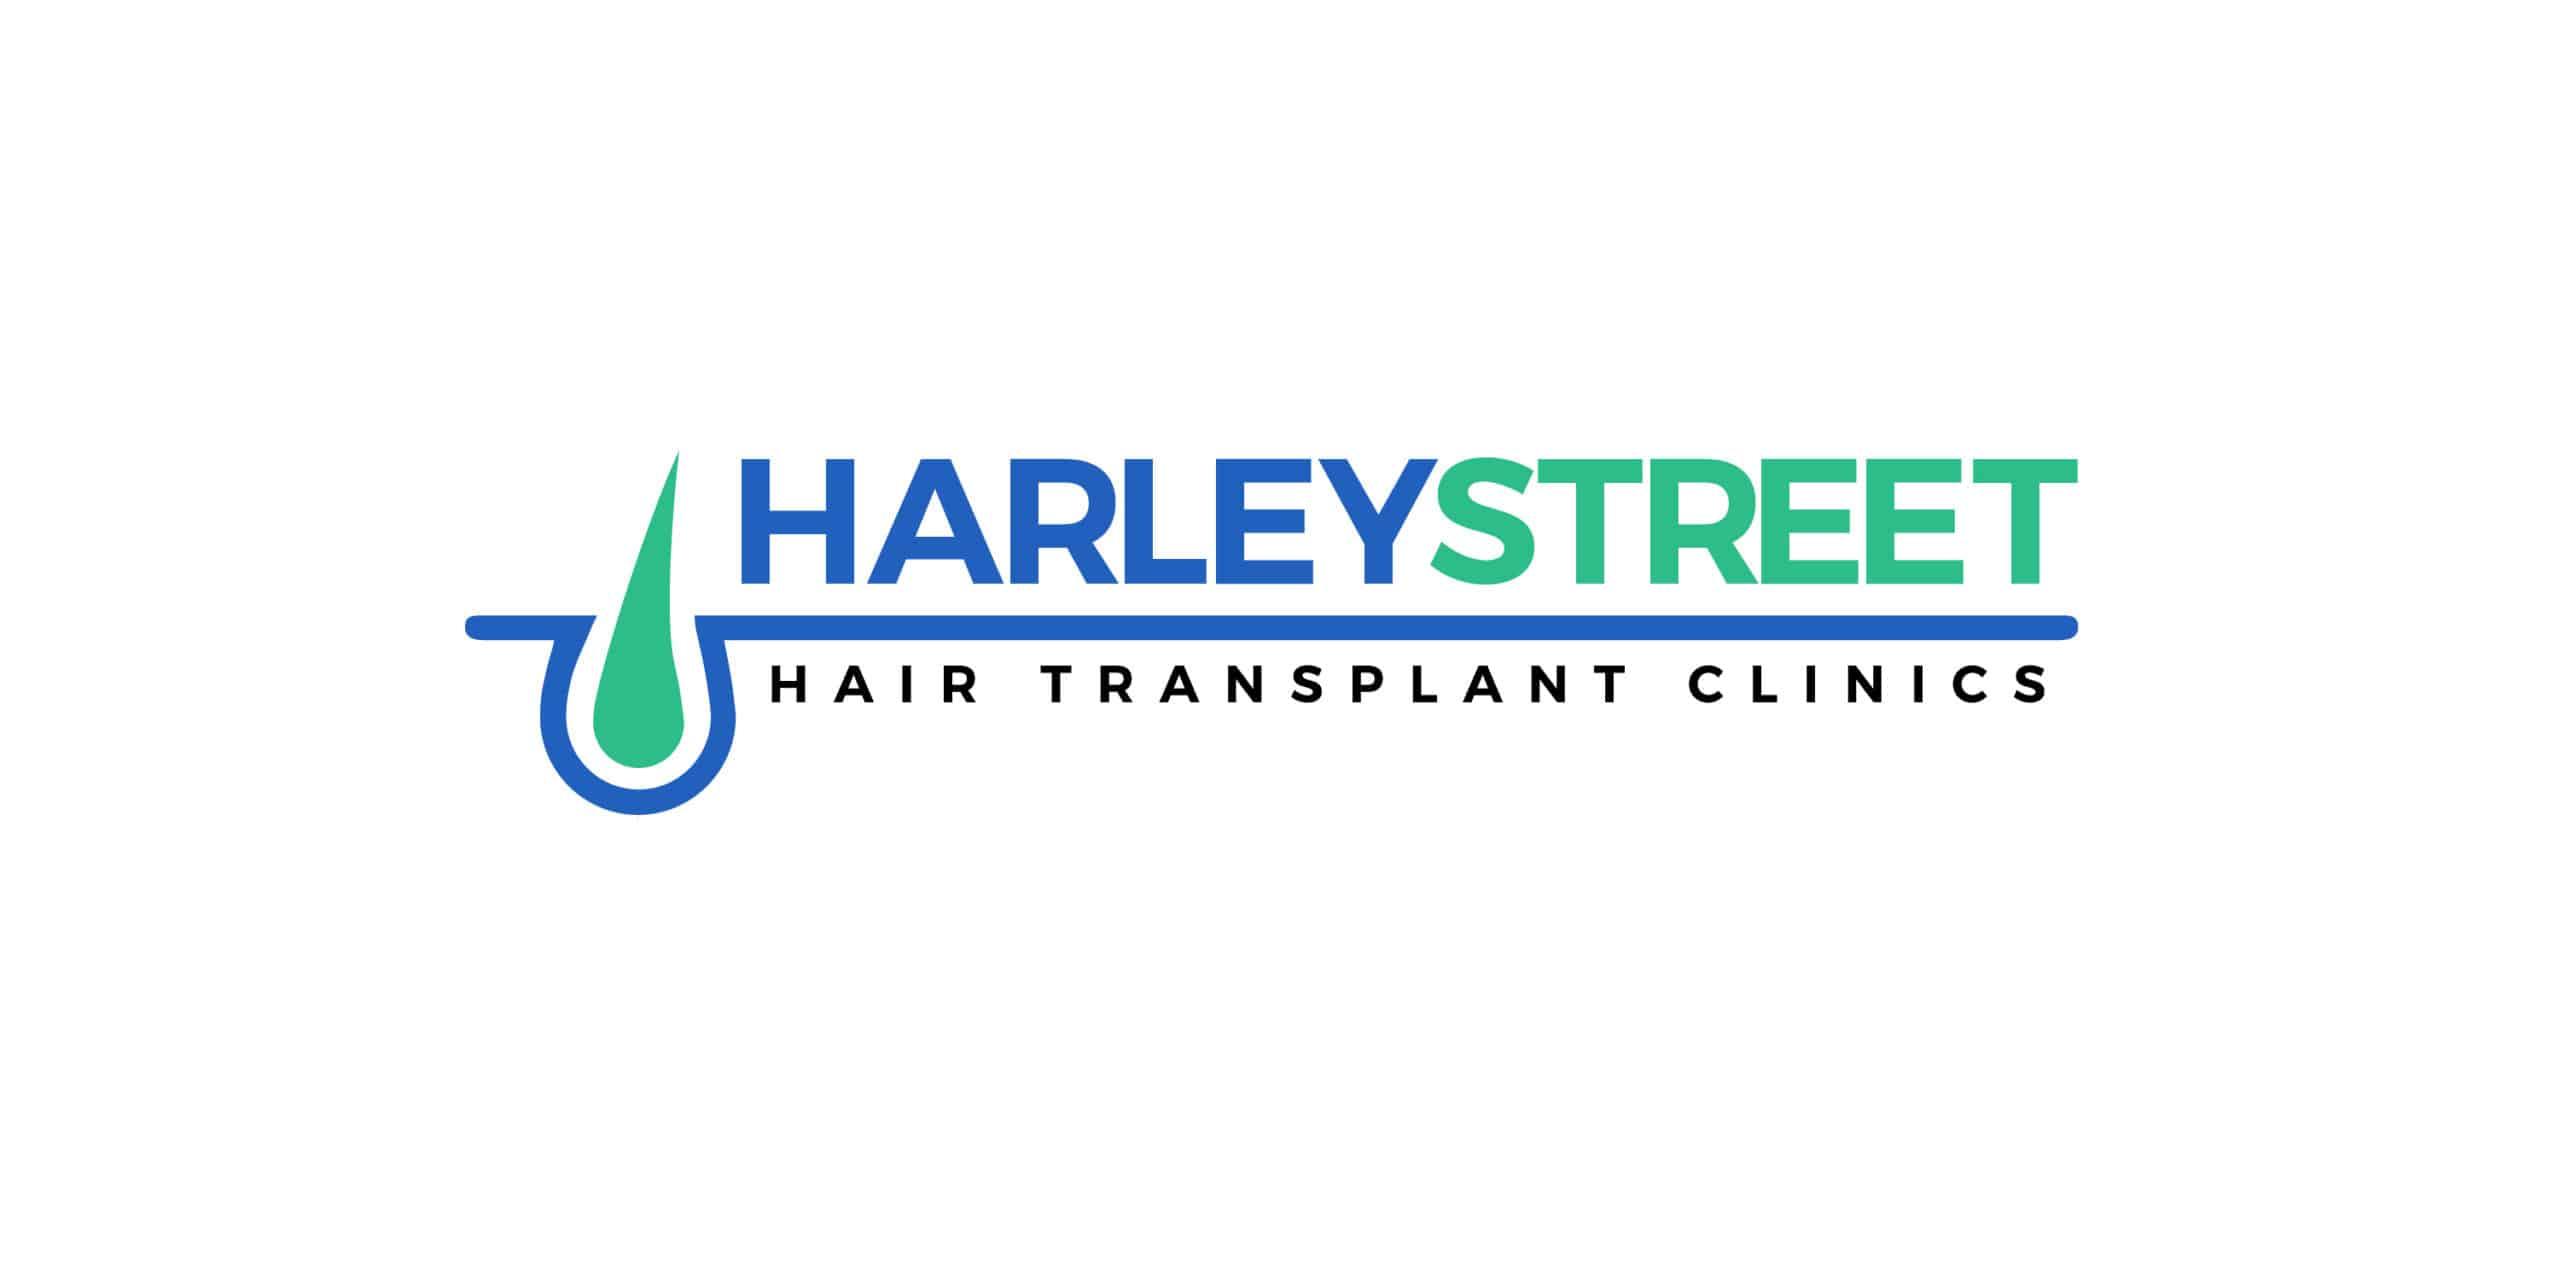 harley street hair transplant clinics